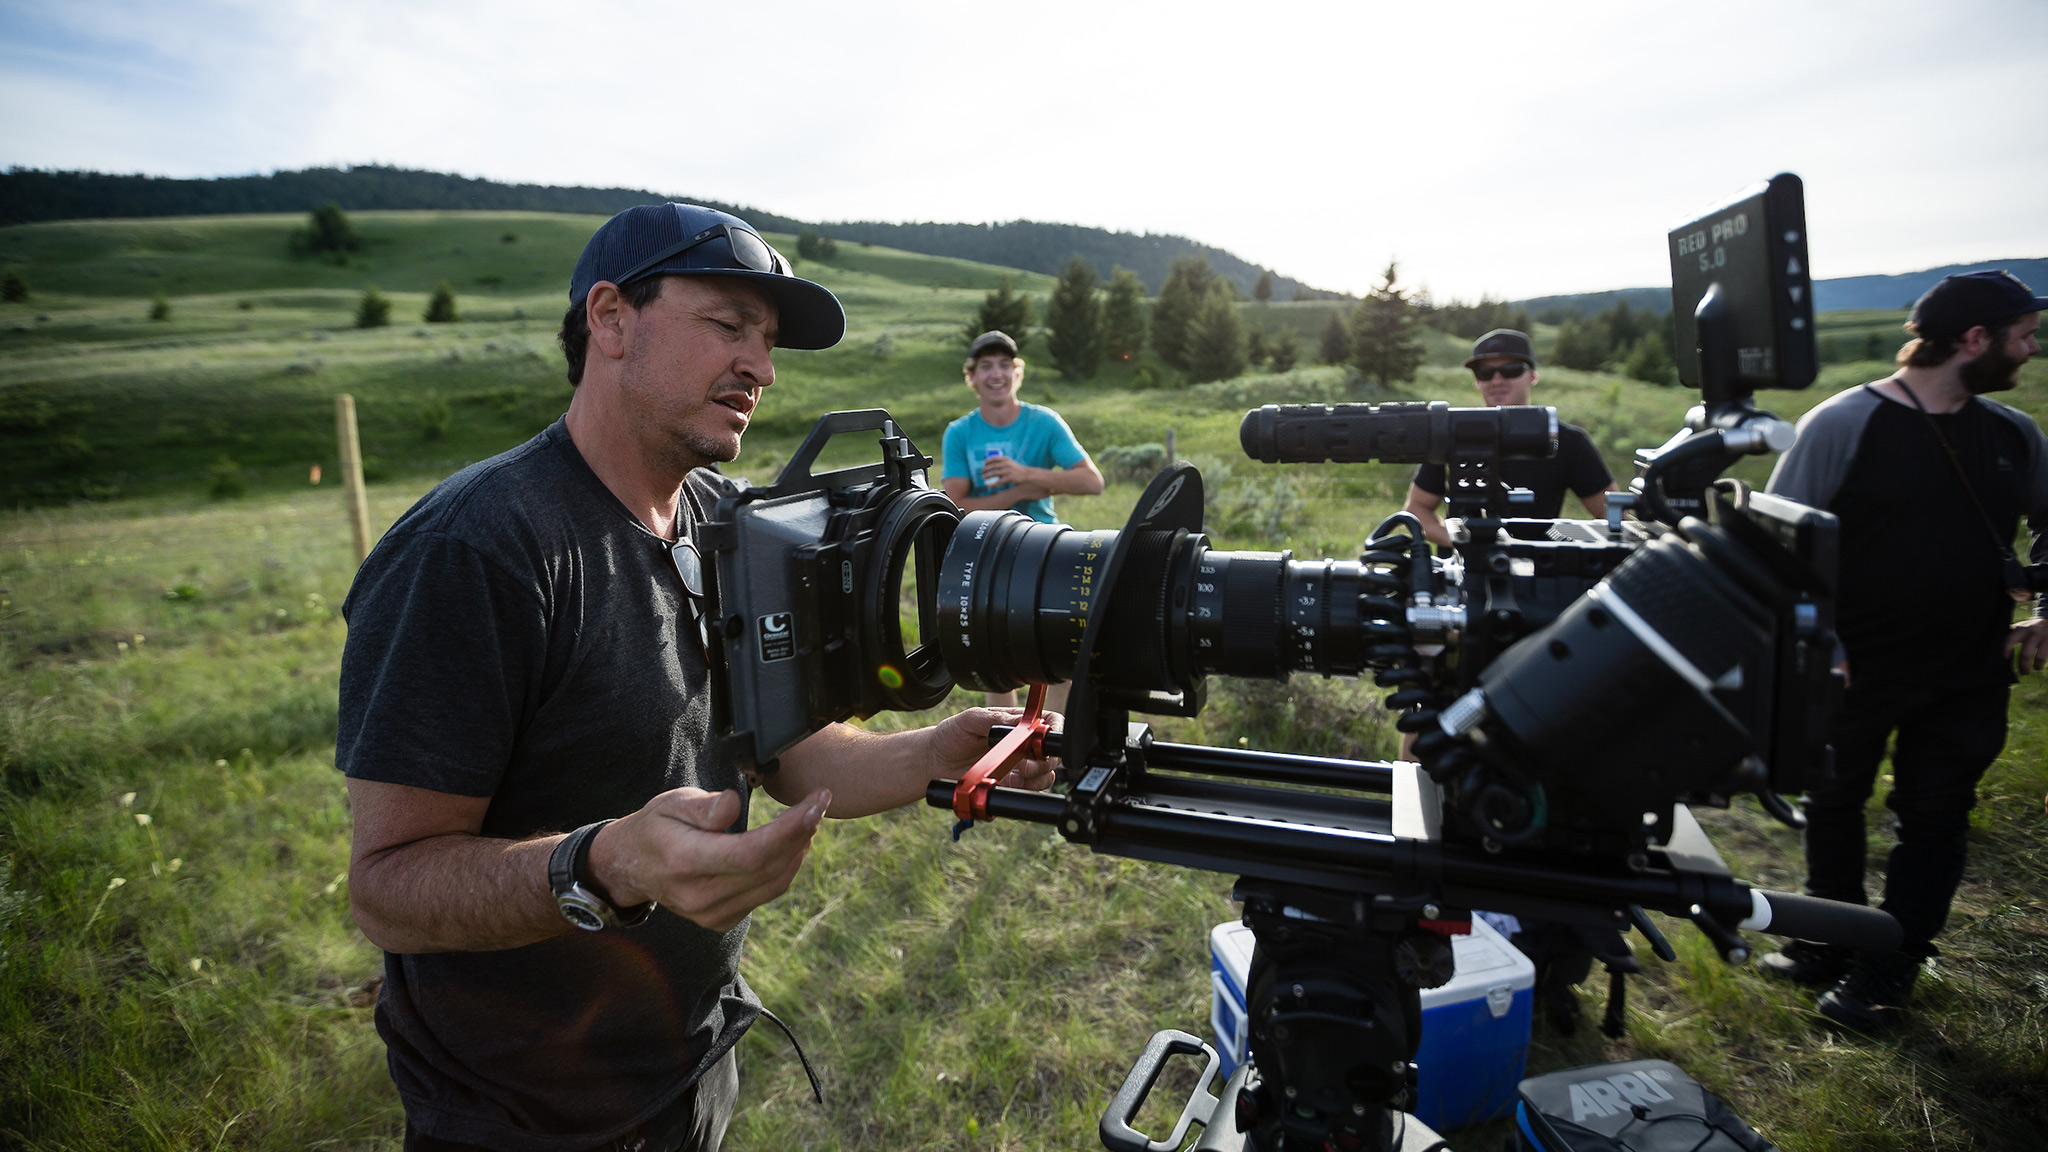 Foster's filmer: Anthony Vitale